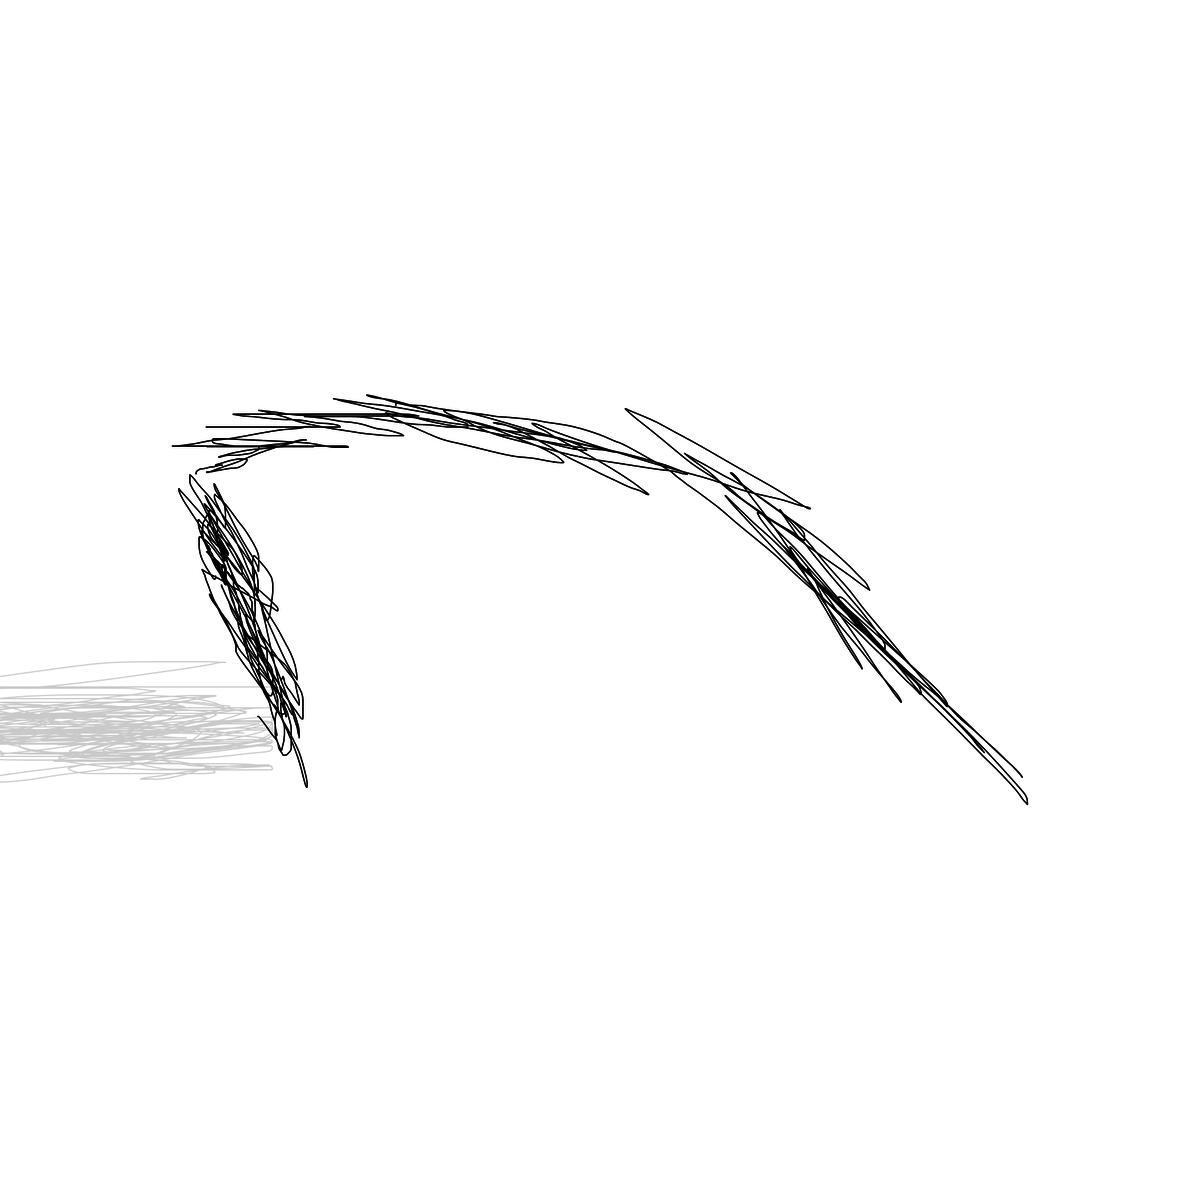 BAAAM drawing#11377 lat:52.4760093688964840lng: 13.4061803817749020